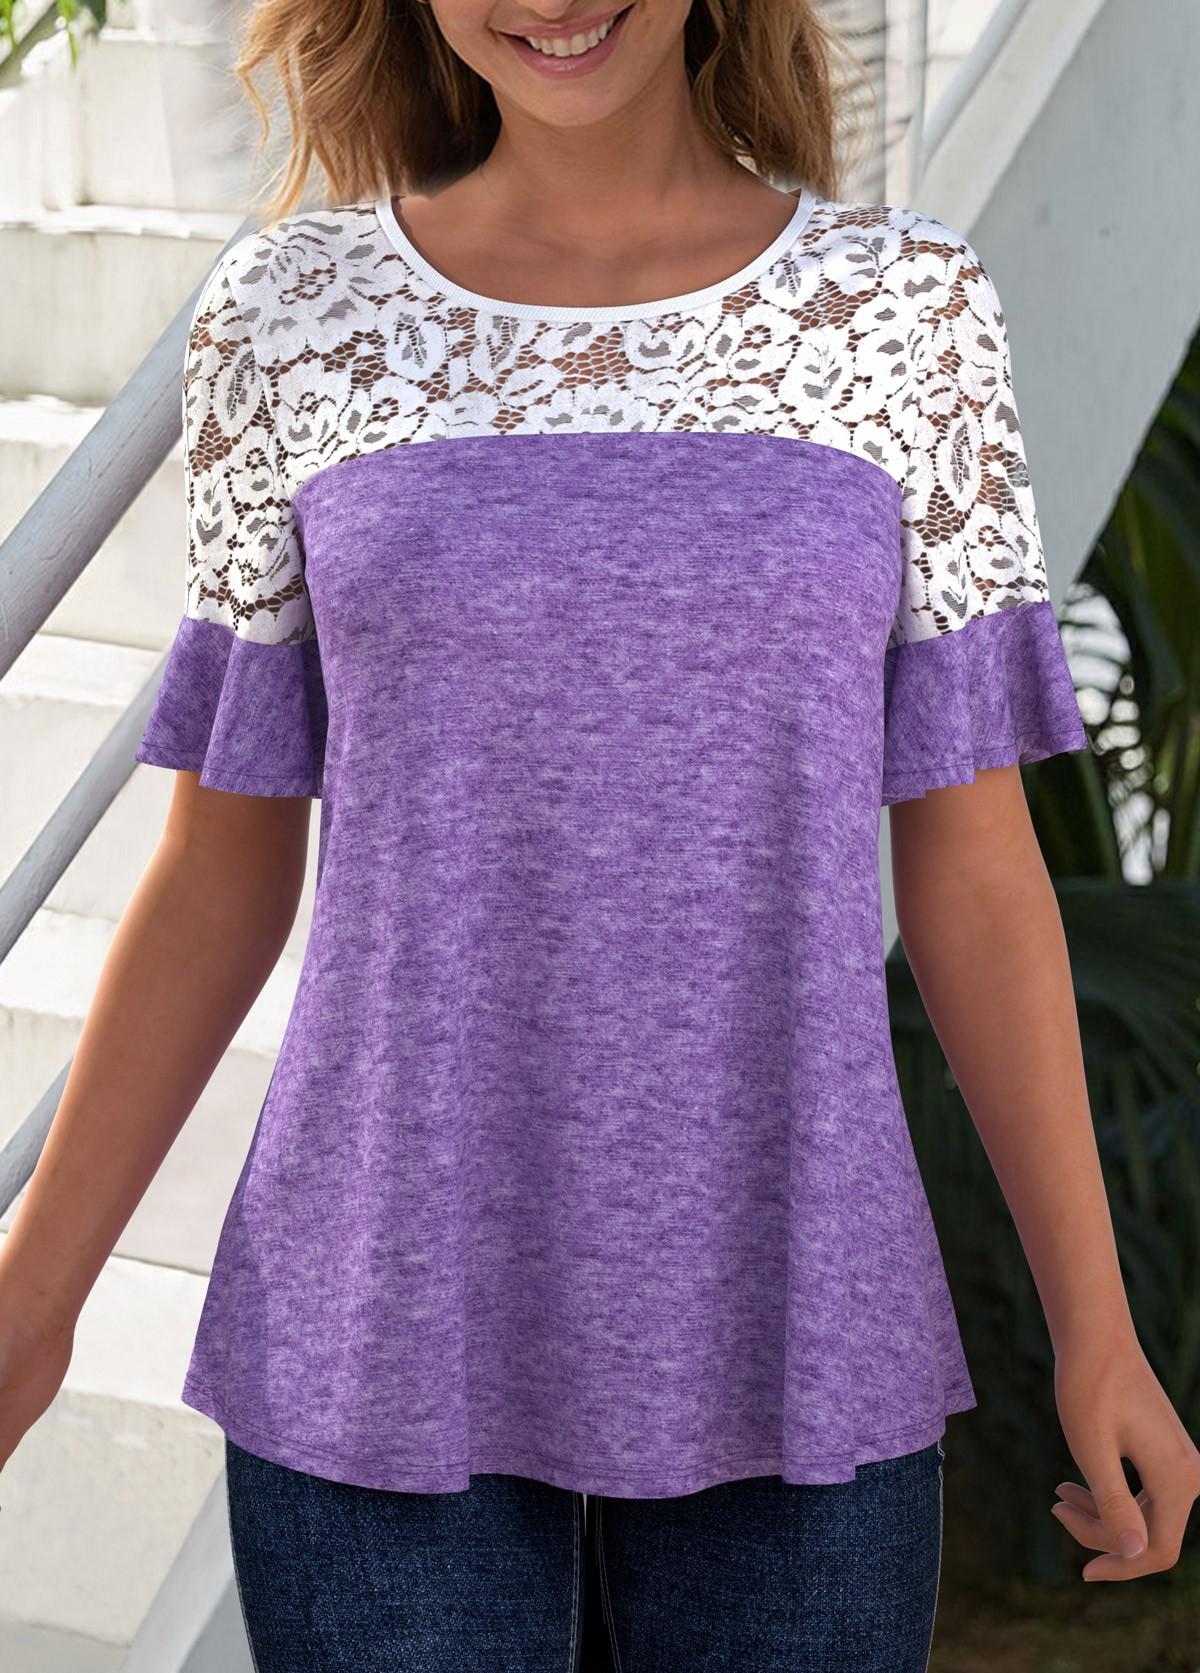 ROTITA Lace Patchwork Round Neck Short Sleeve T Shirt